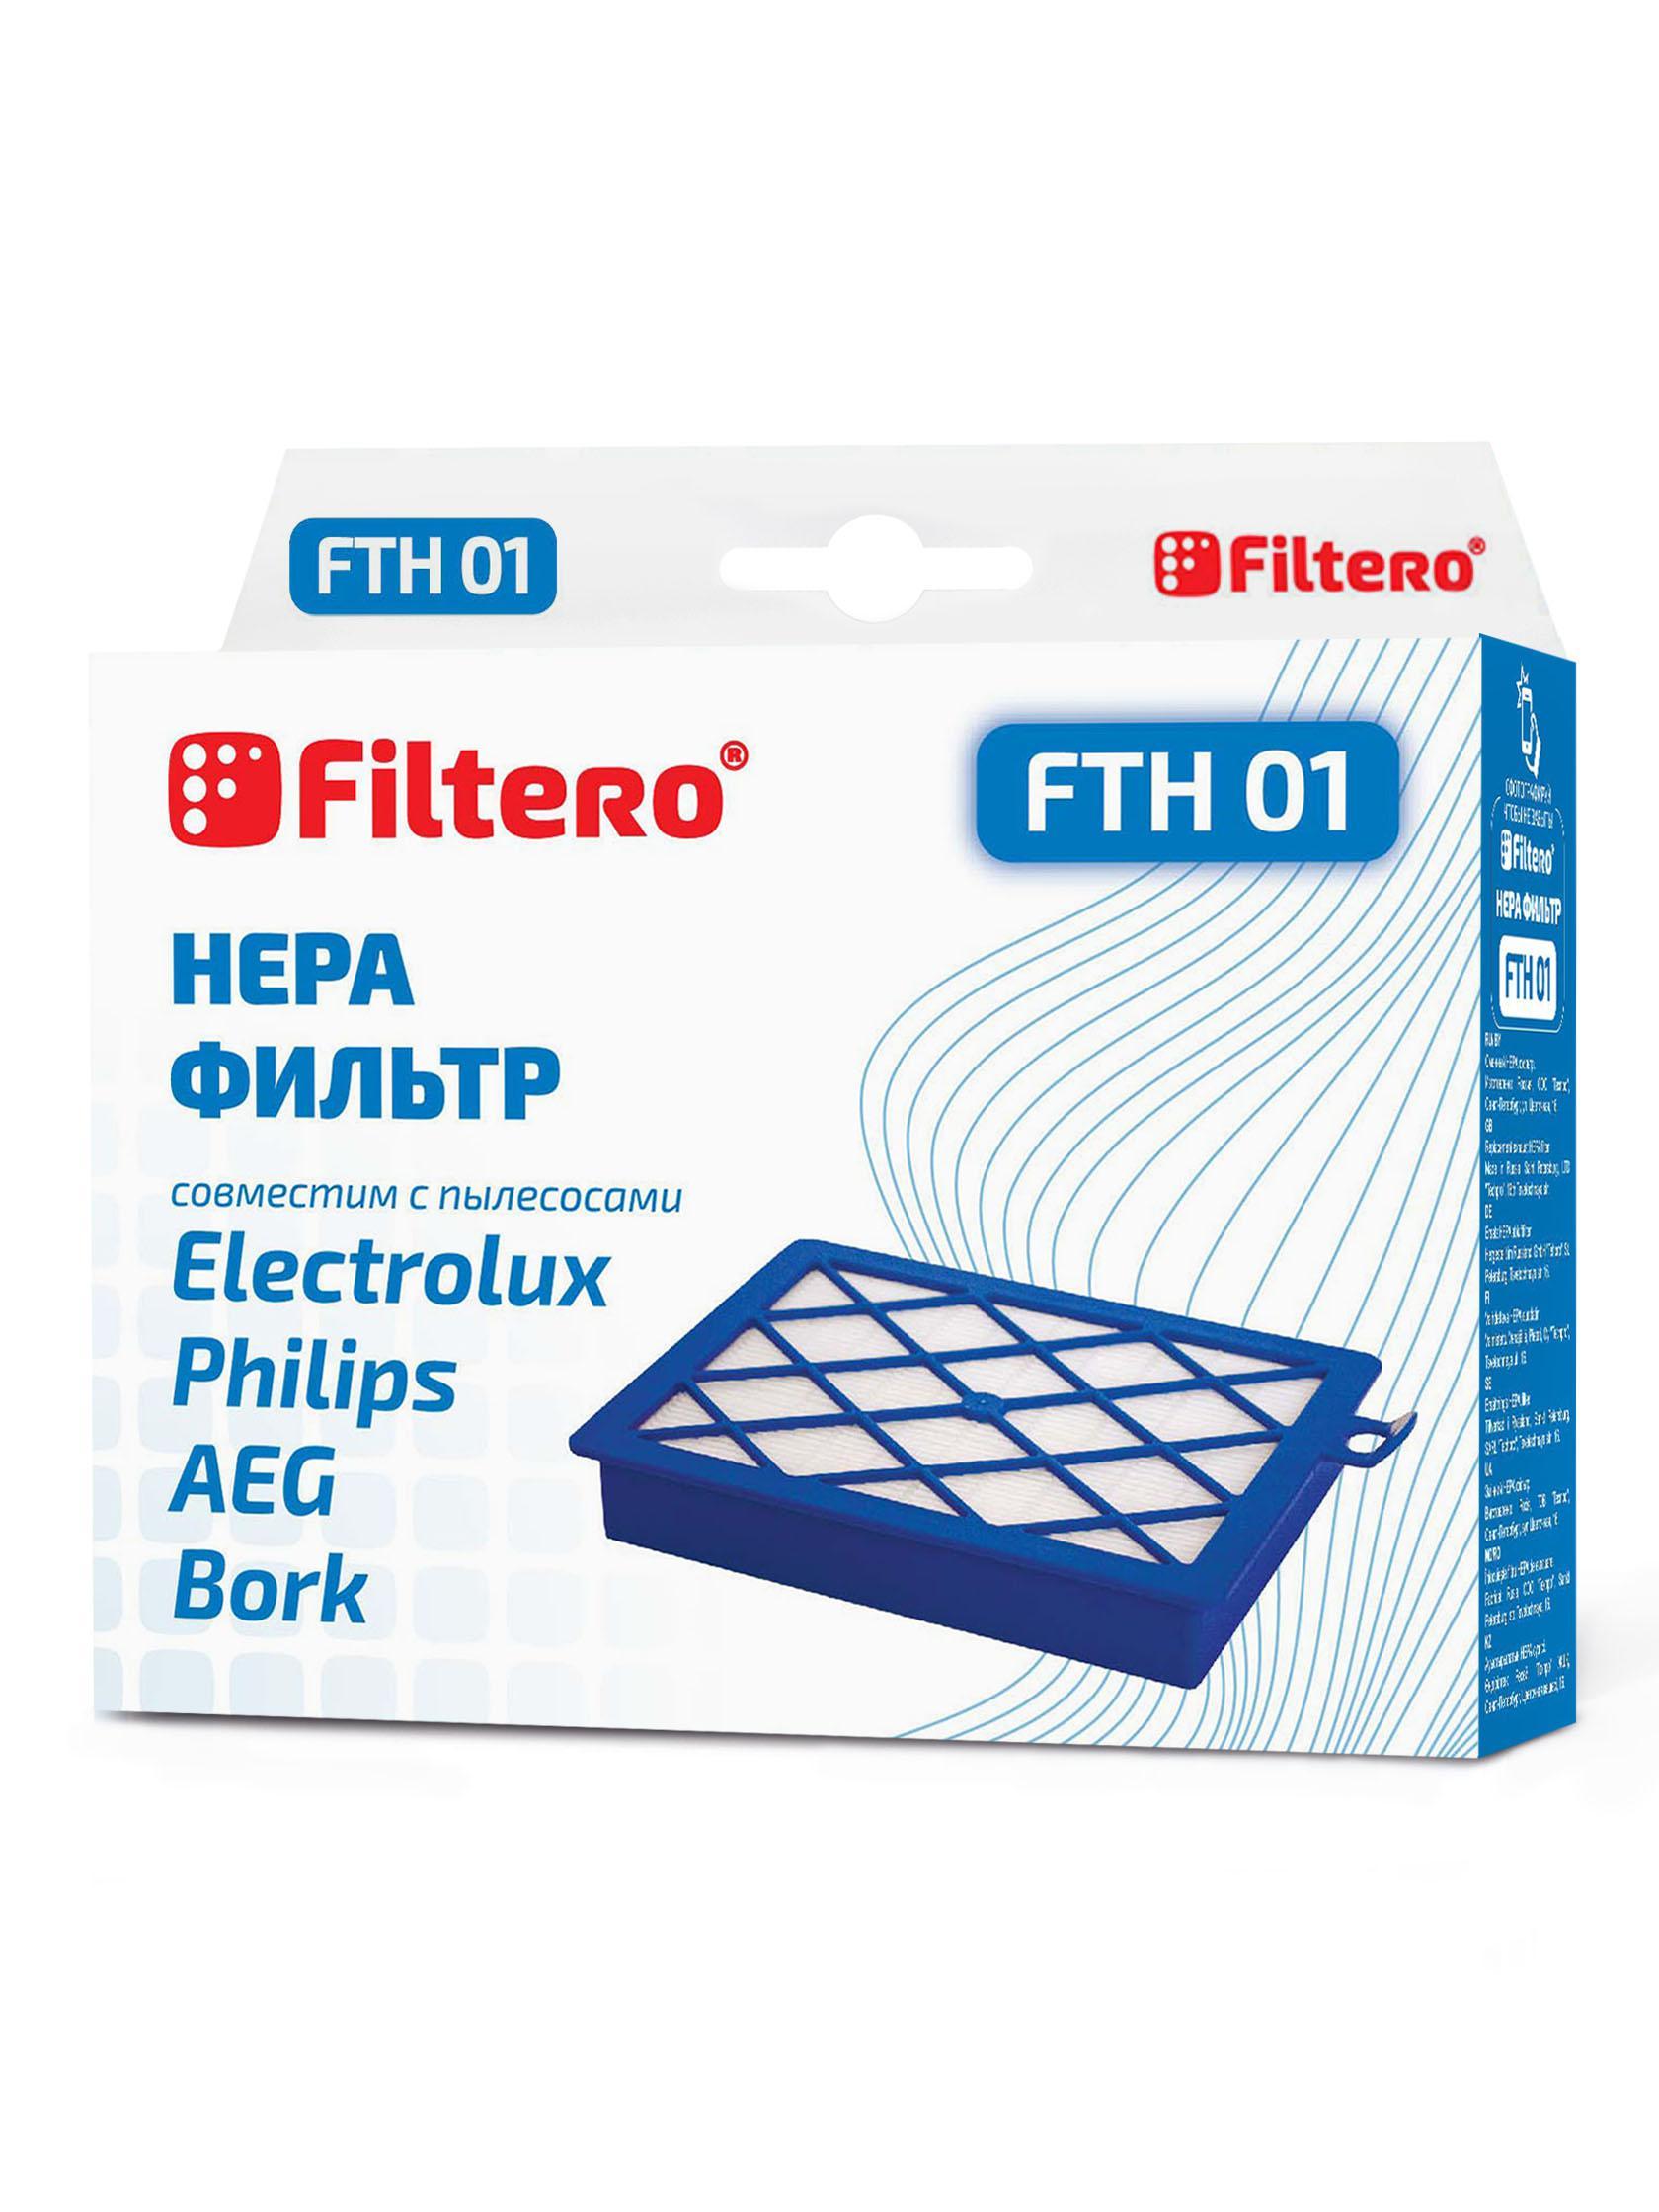 Фильтр Filtero Fth 01 elx нера фильтр filtero fth 01 w elx 1 шт для пылесосов aeg arnica bork electrolux philips